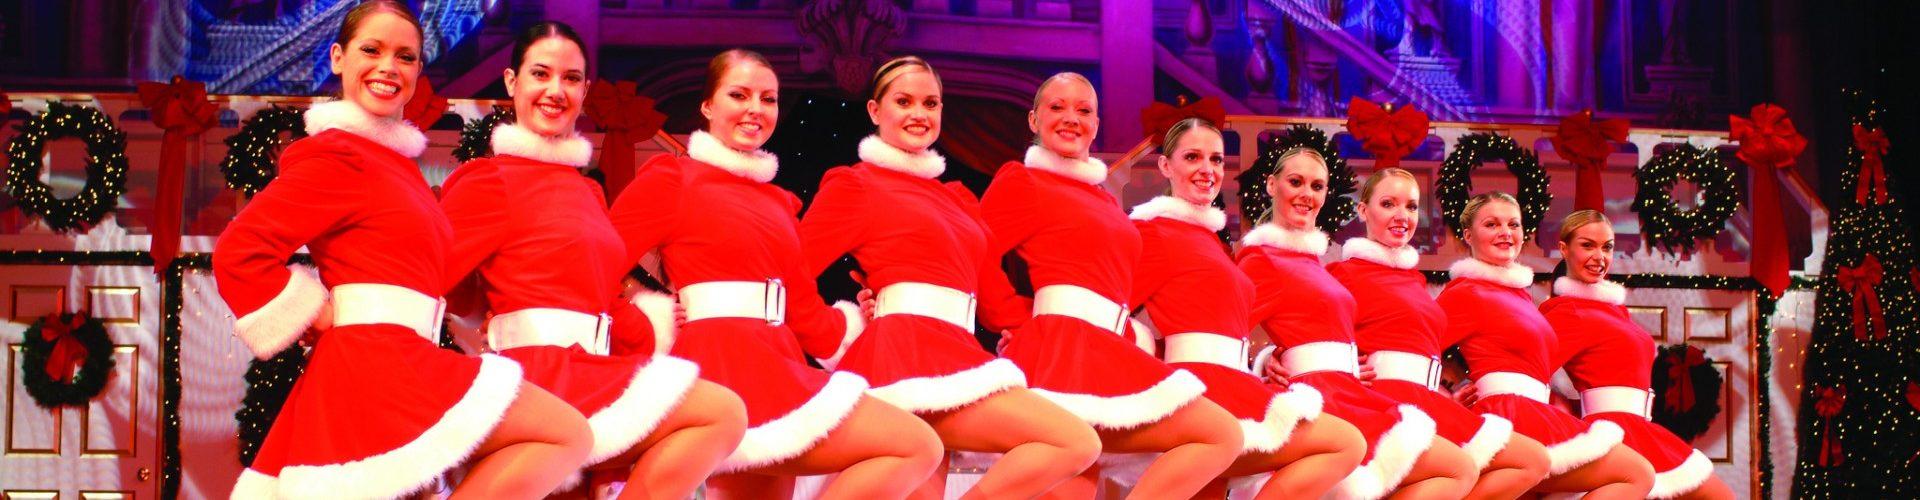 Christmas Shows.When Do Christmas Shows Start In Branson Branson Travel